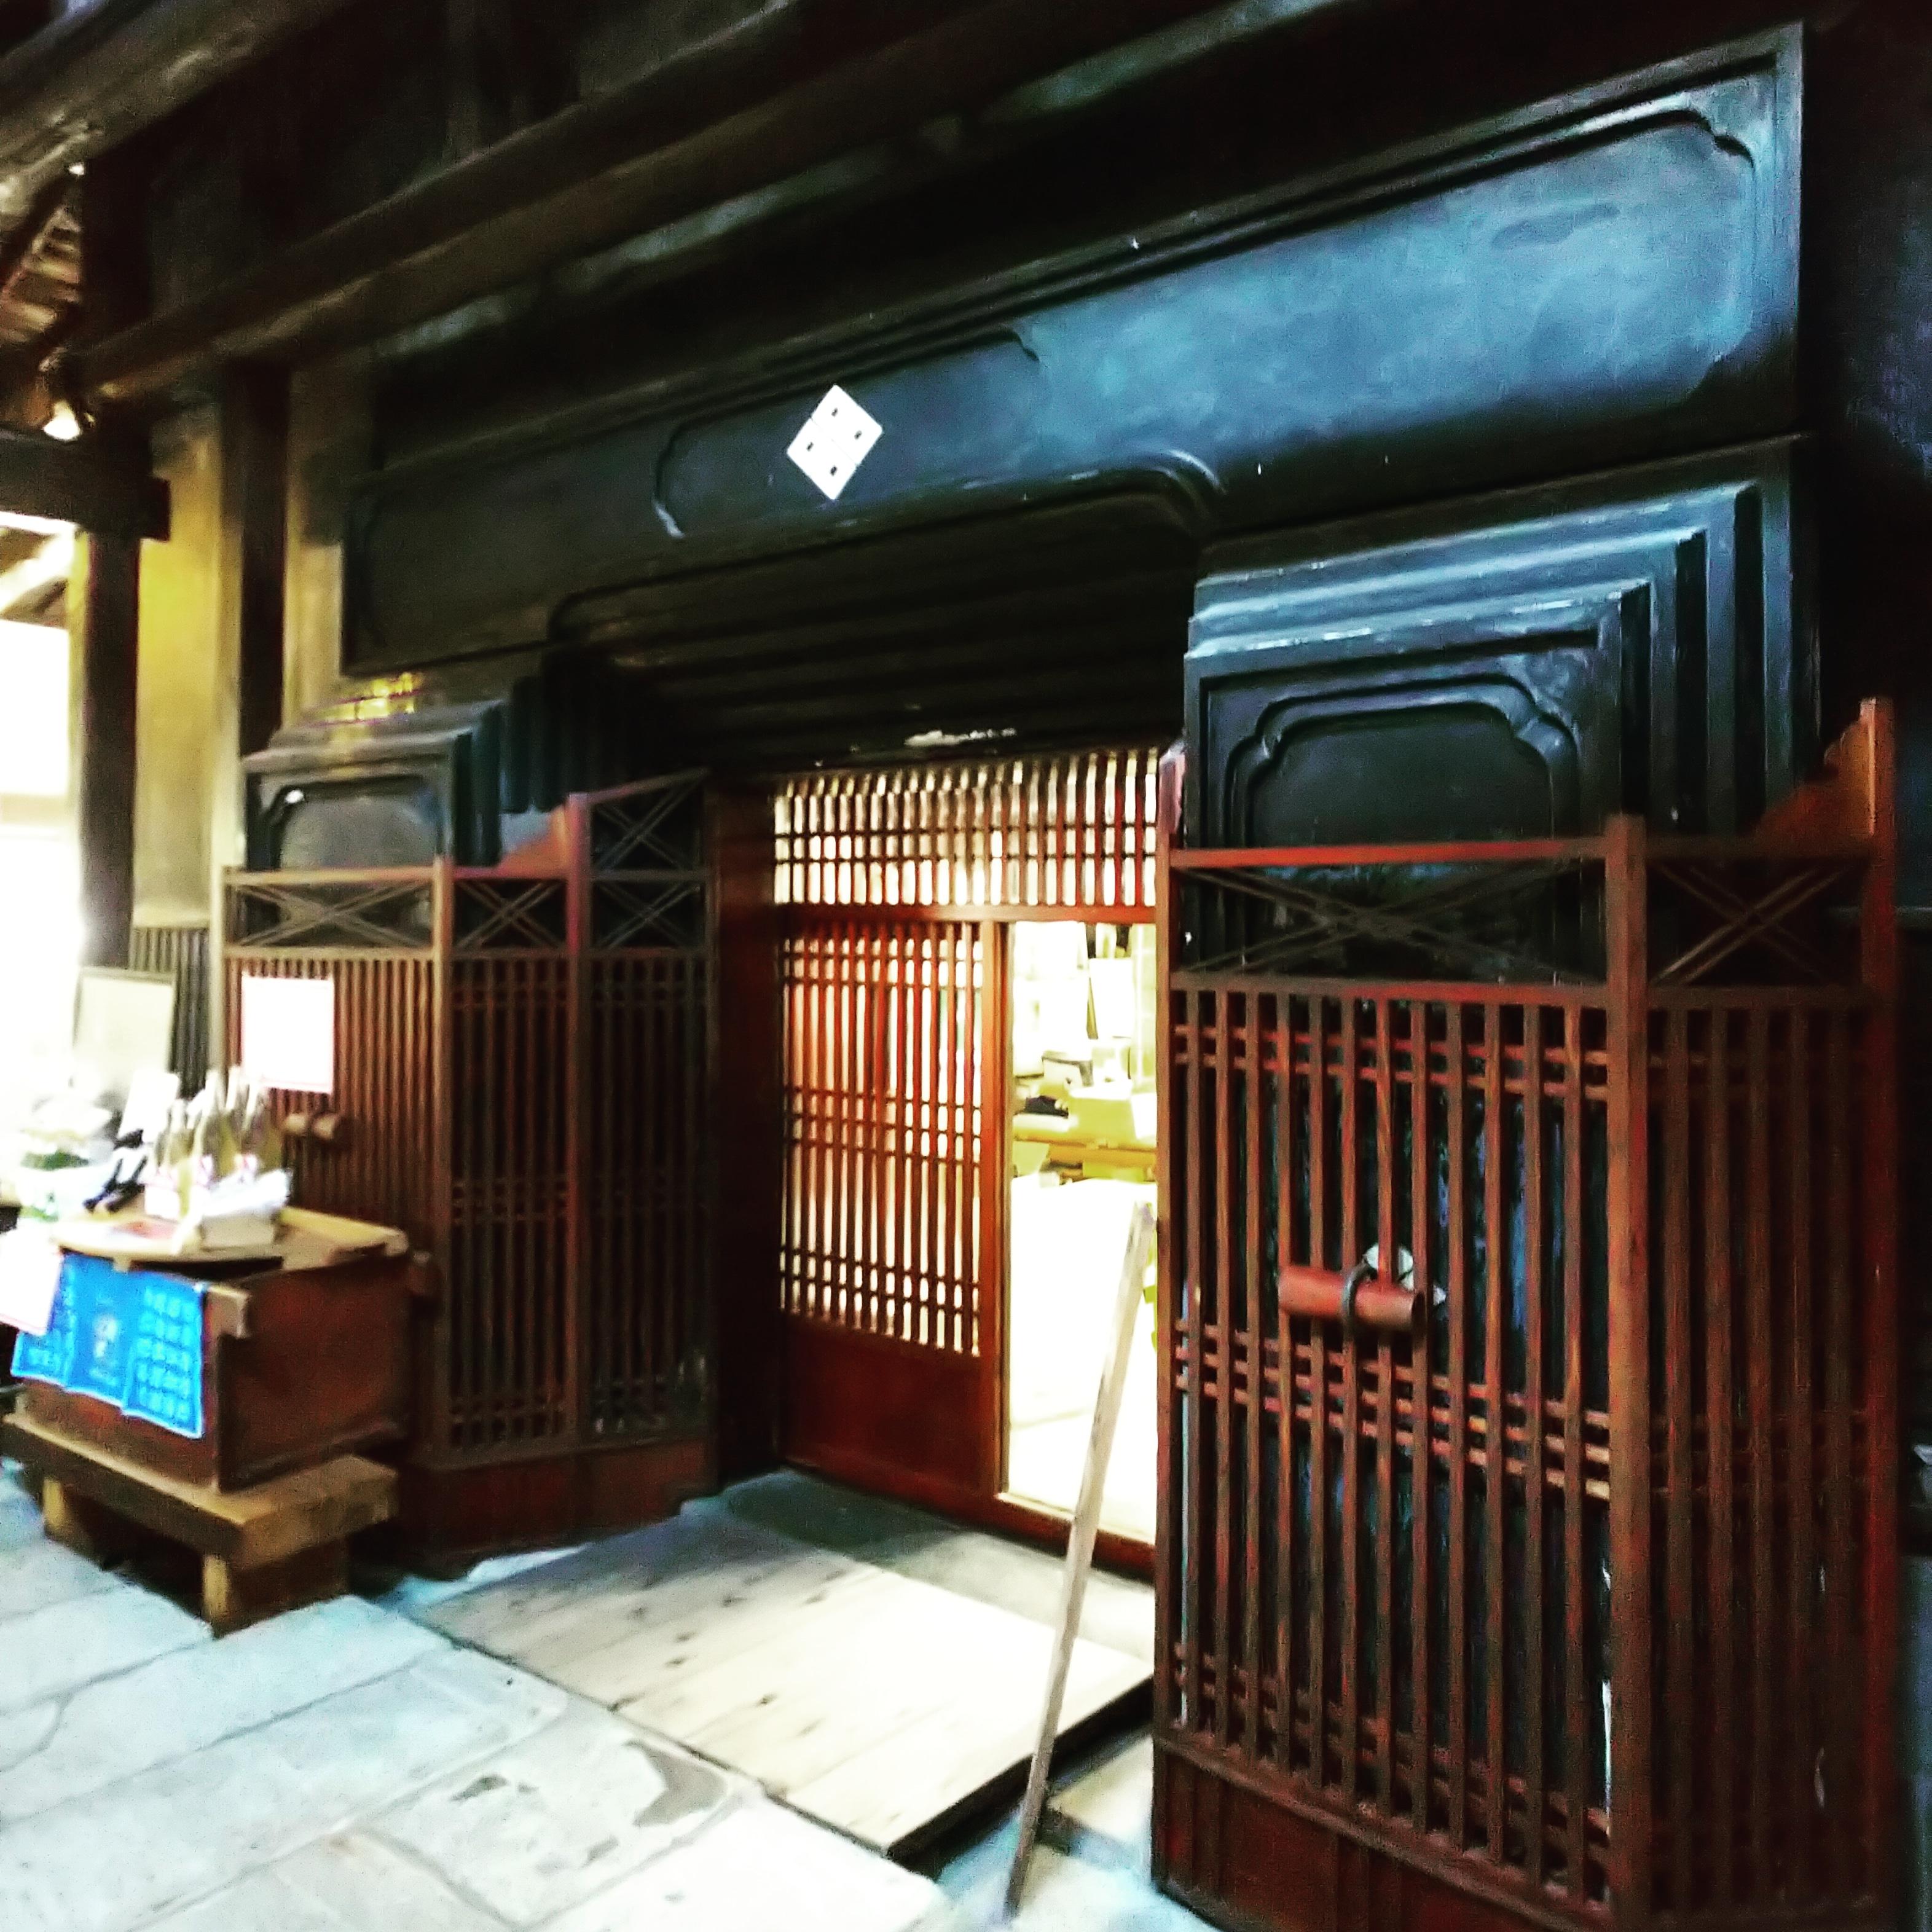 http://www.fukukomachi.com/blog/photo/IMG_20200511_133743_296.jpg